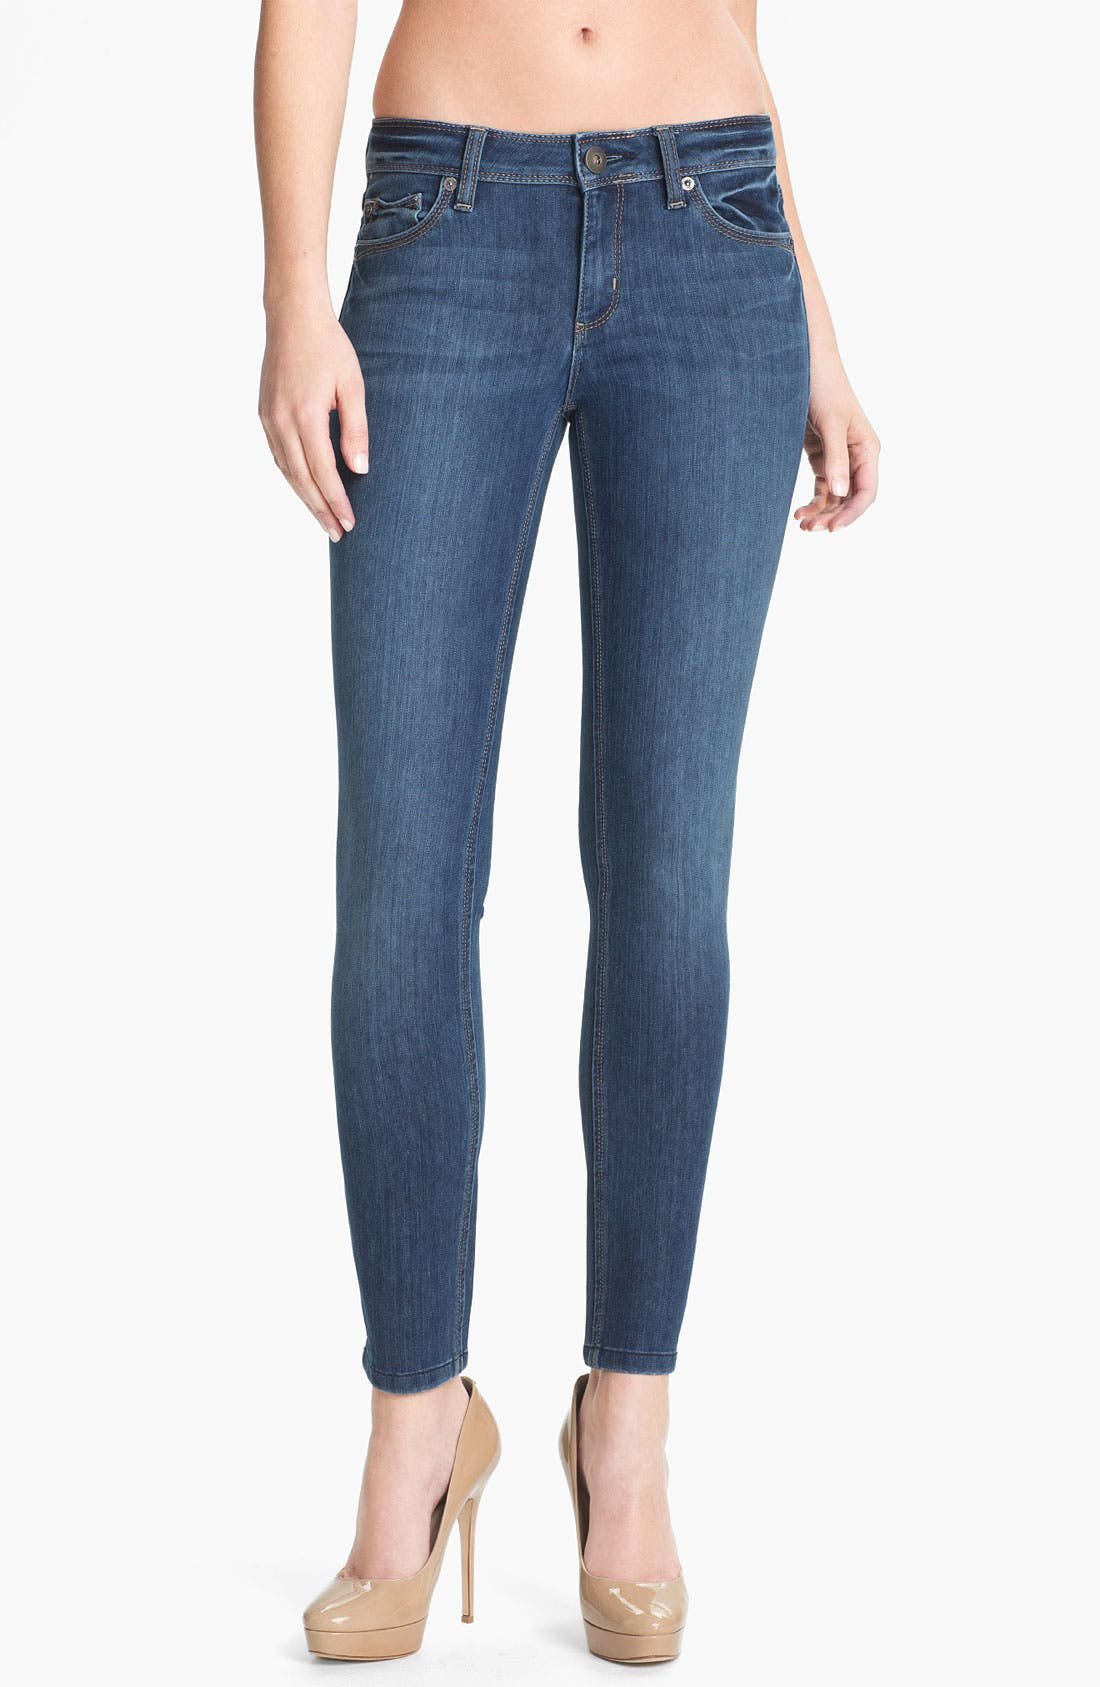 Main Image - DL1961 'Angel' X-Fit Stretch Denim Skinny Ankle Jeans (Zeppelin)